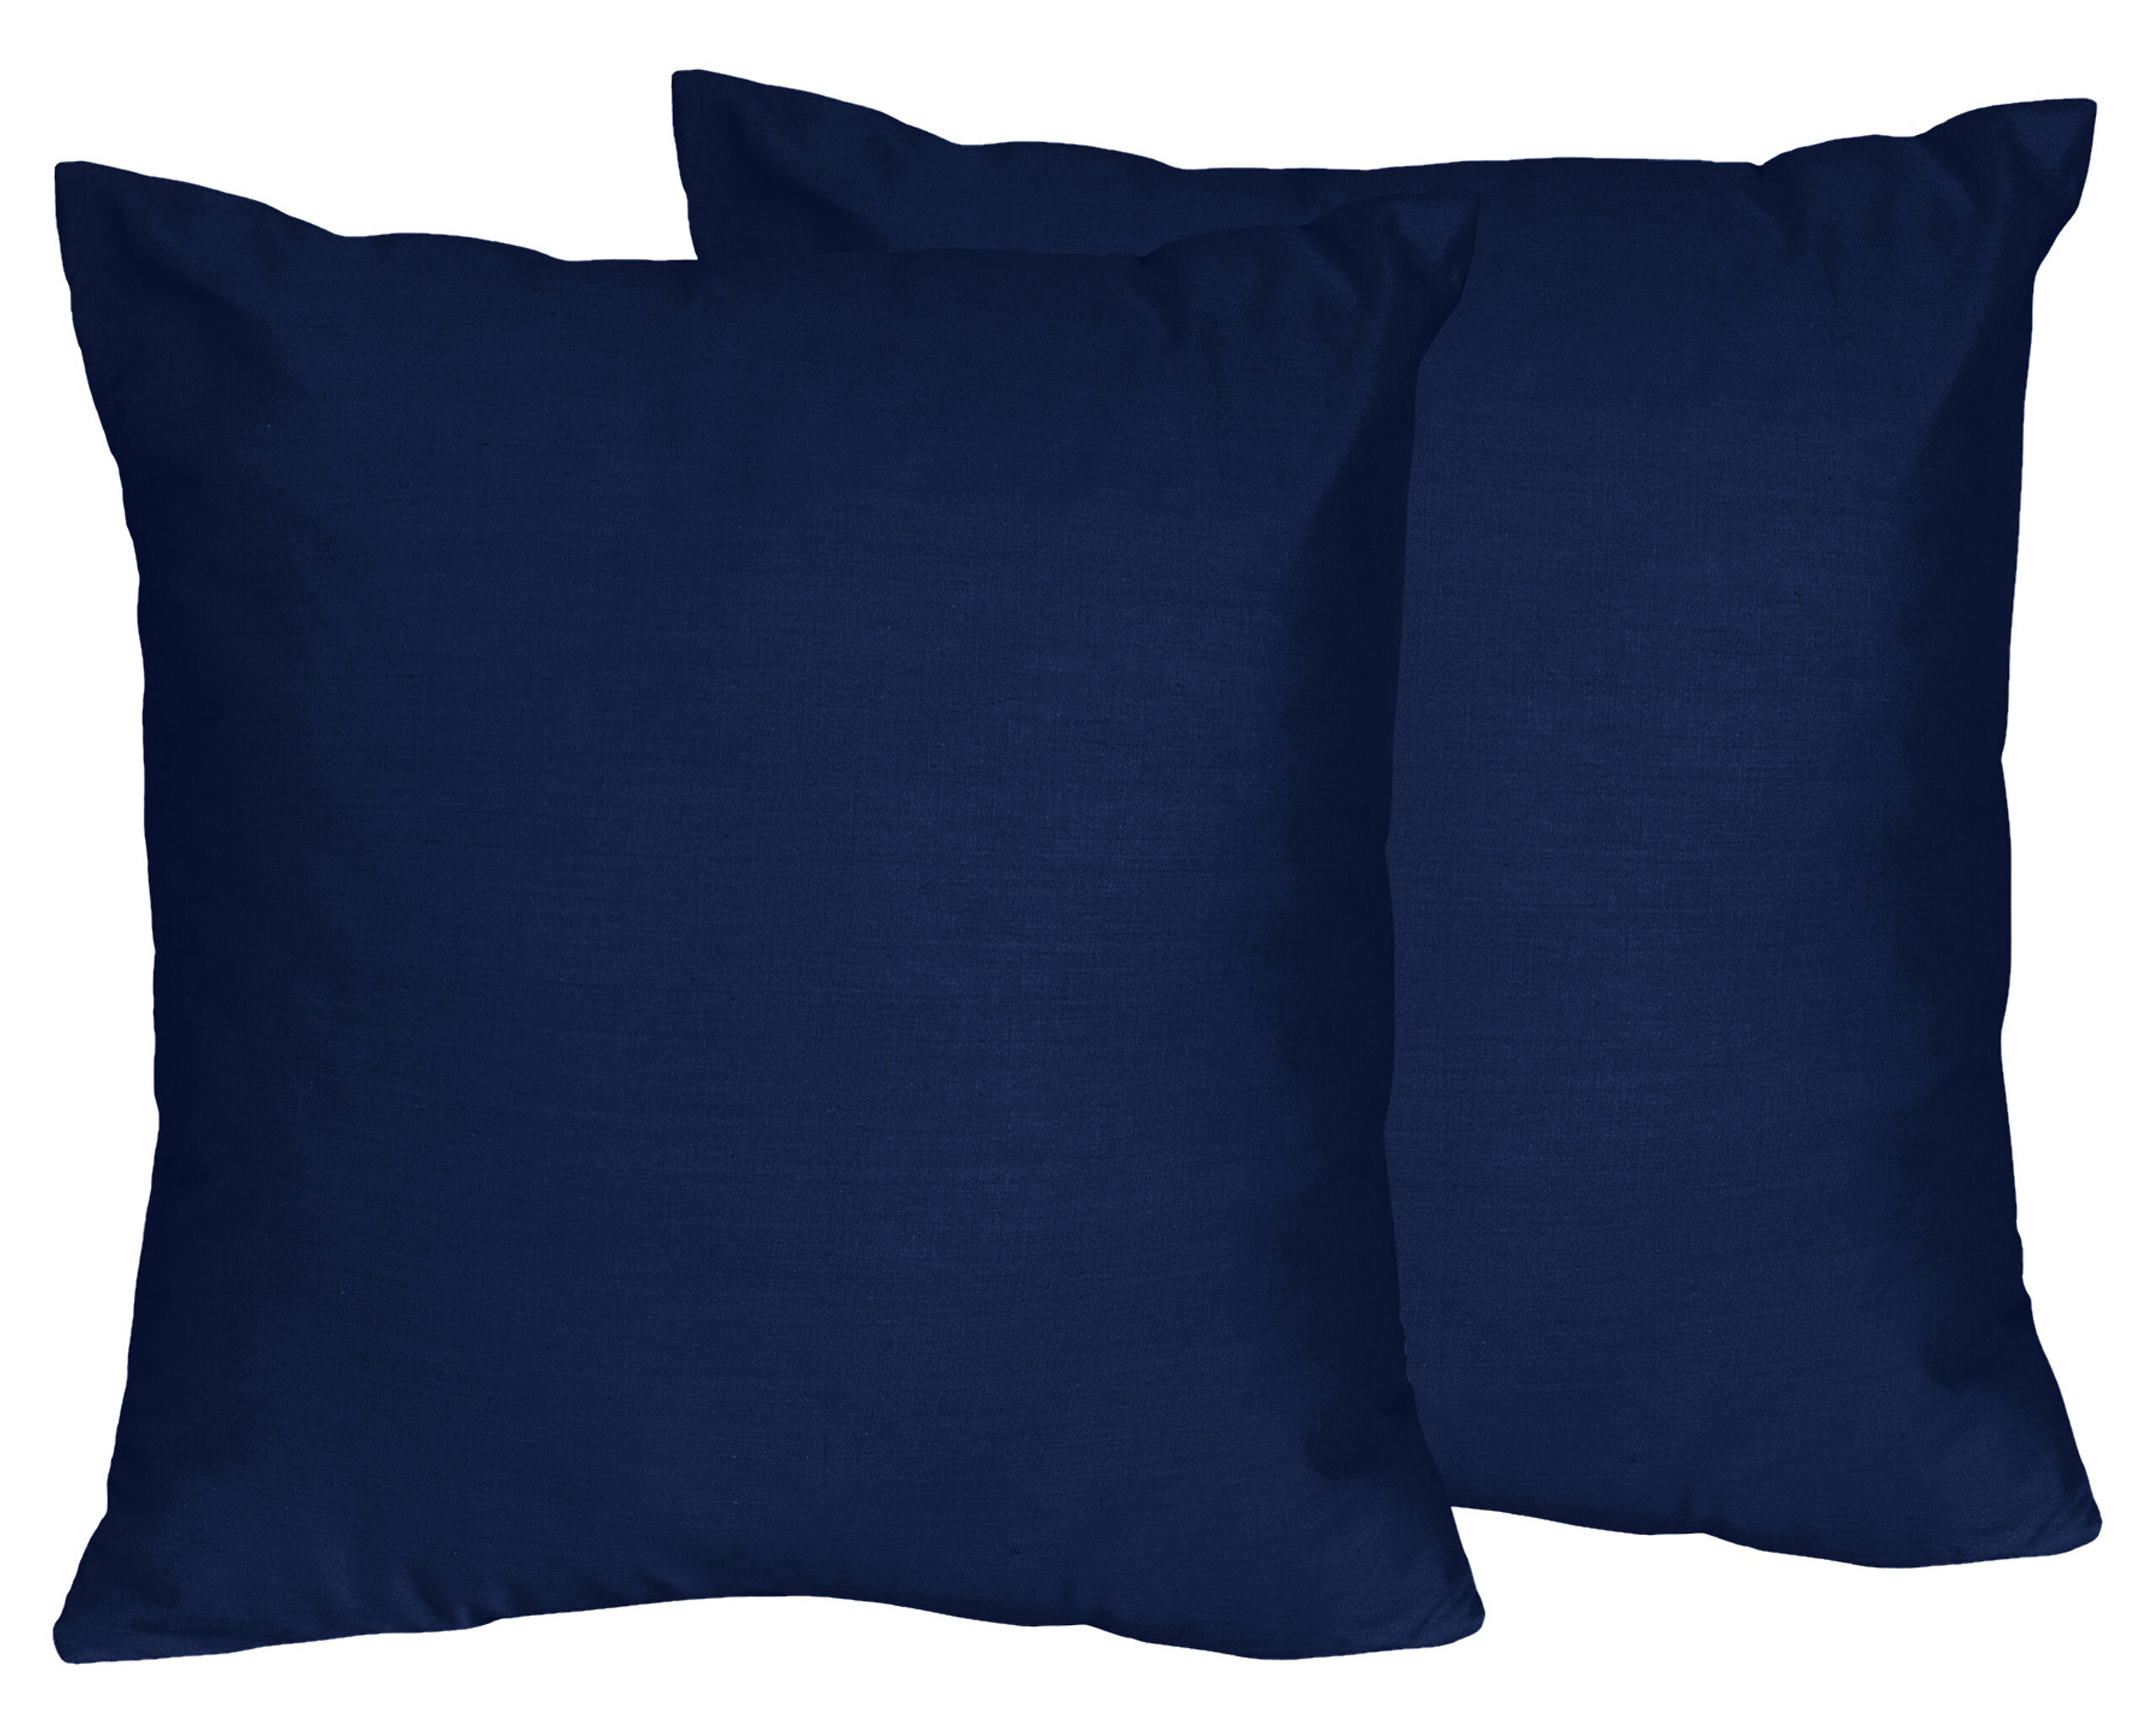 Sweet Jojo Designs Stripe Collection Navy Blue Throw Pillows Set